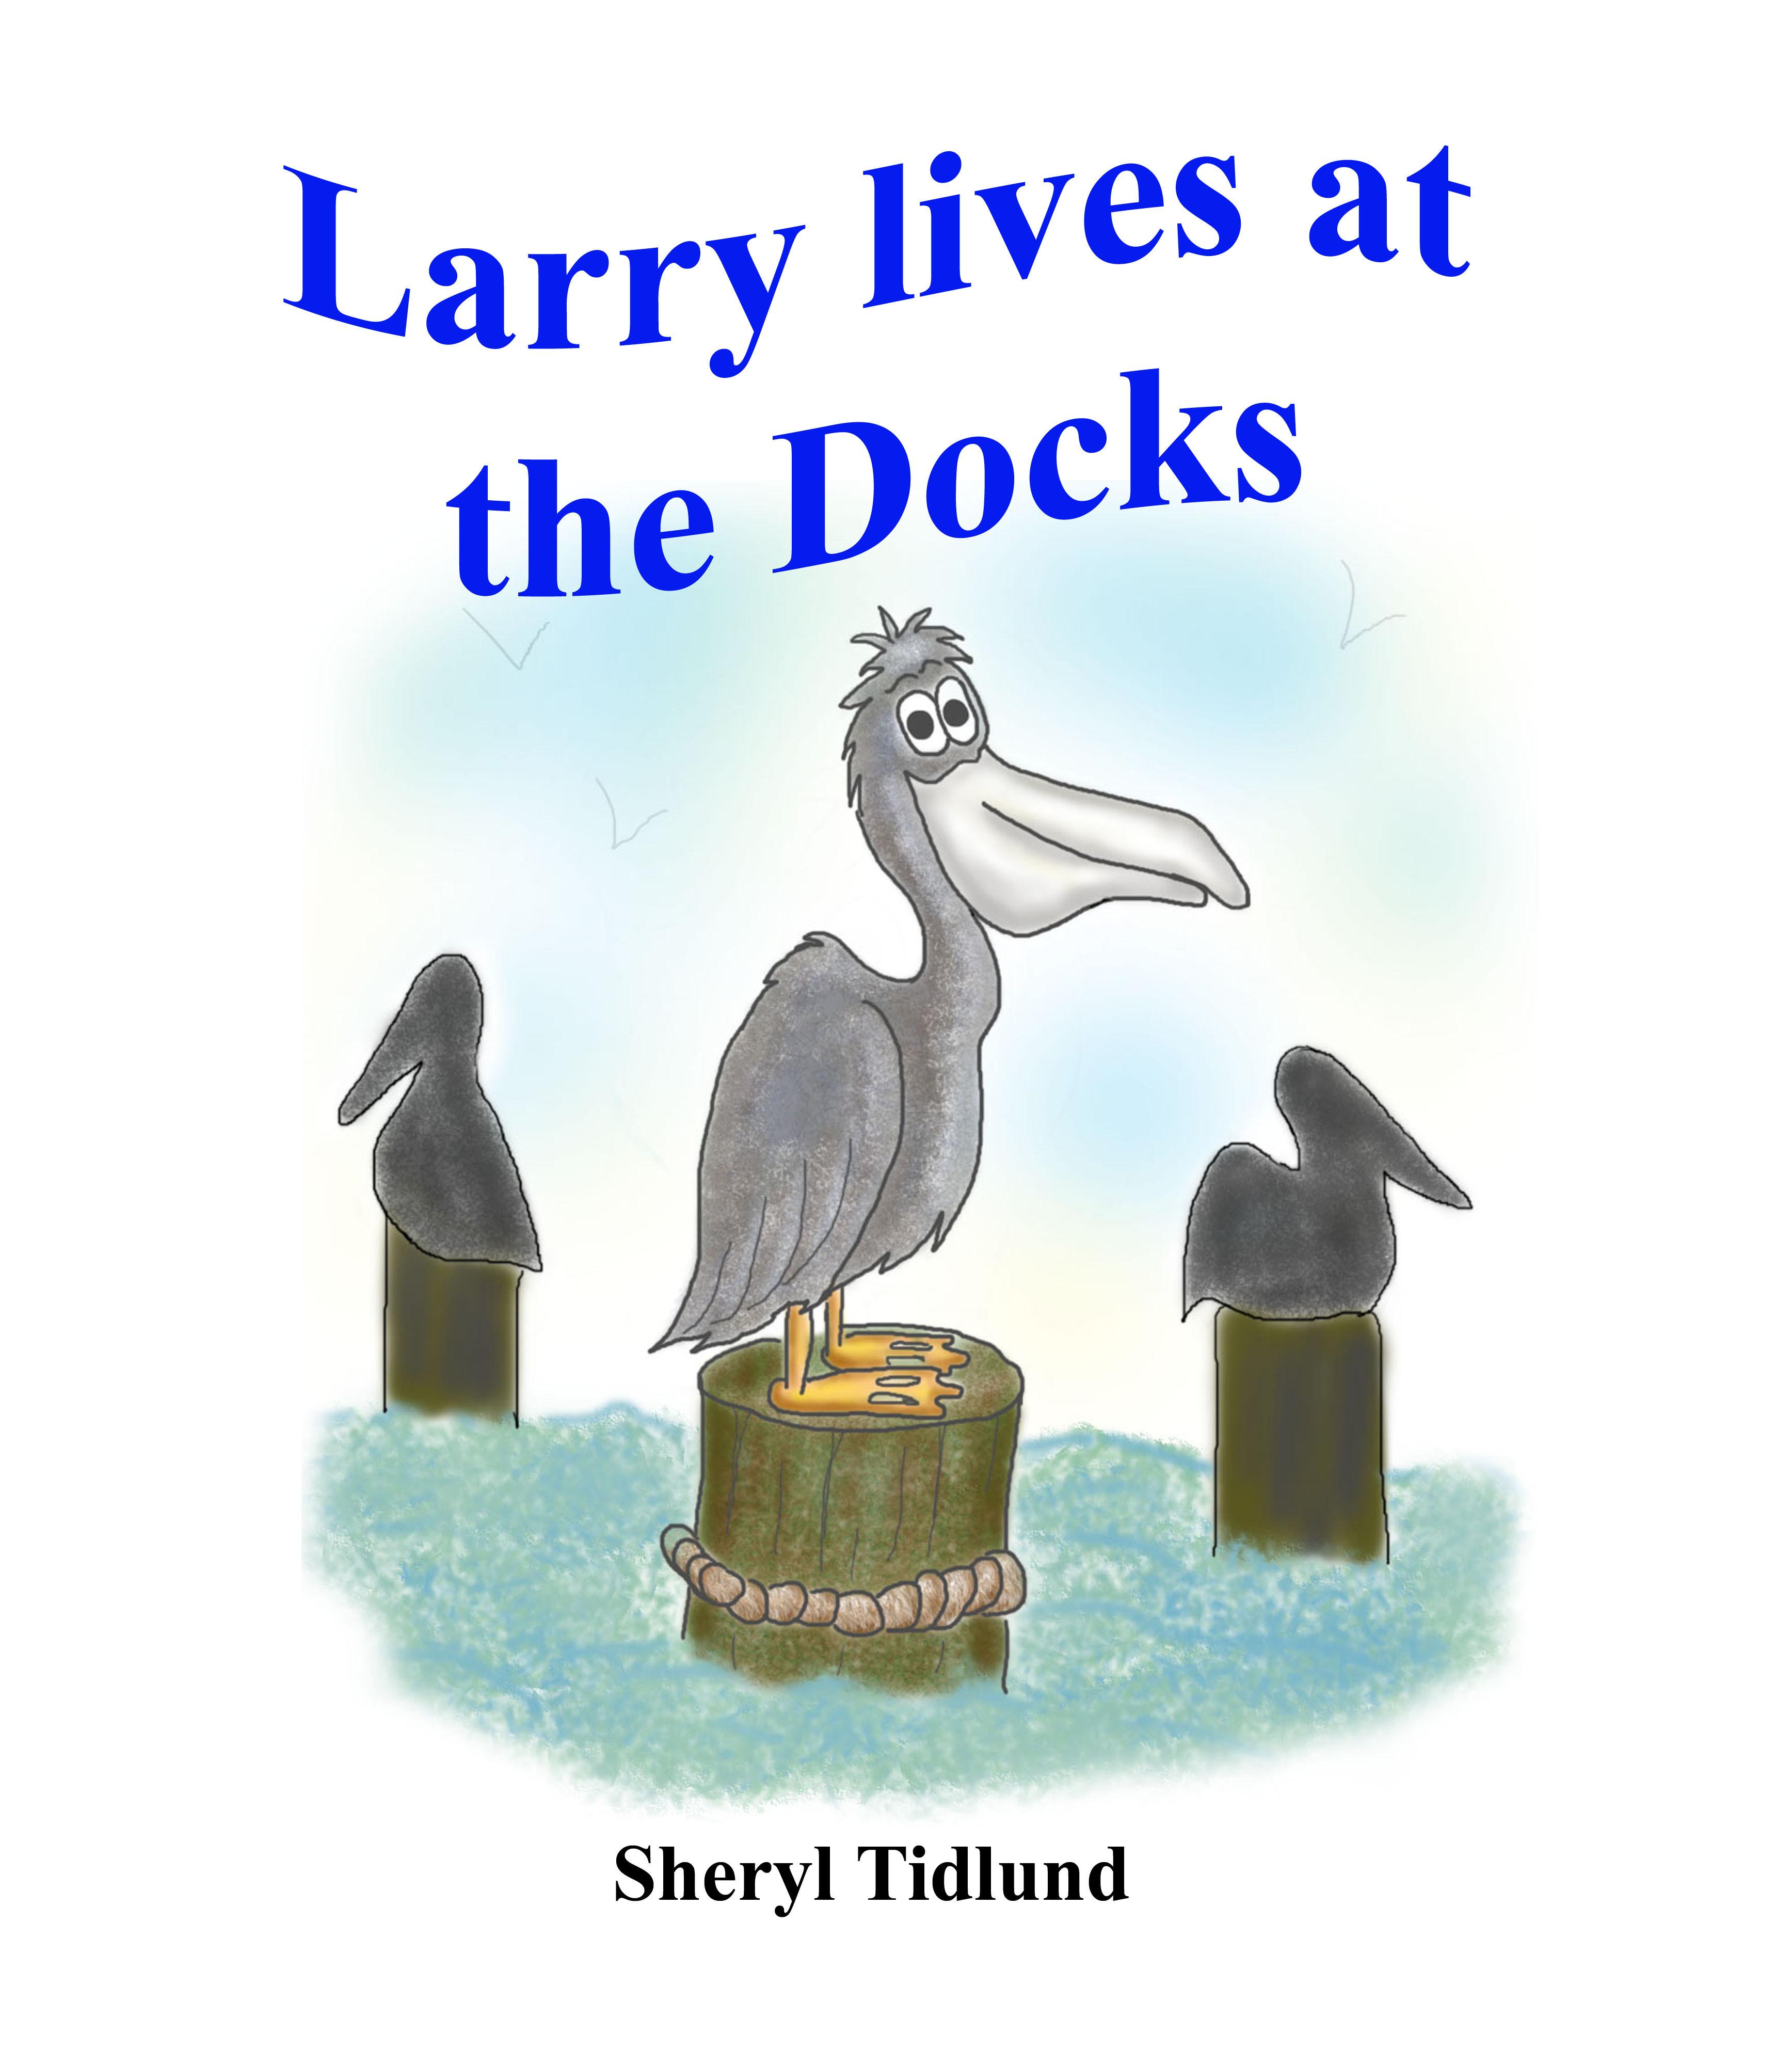 Larry lives at the Dock Sheryl Tidlund